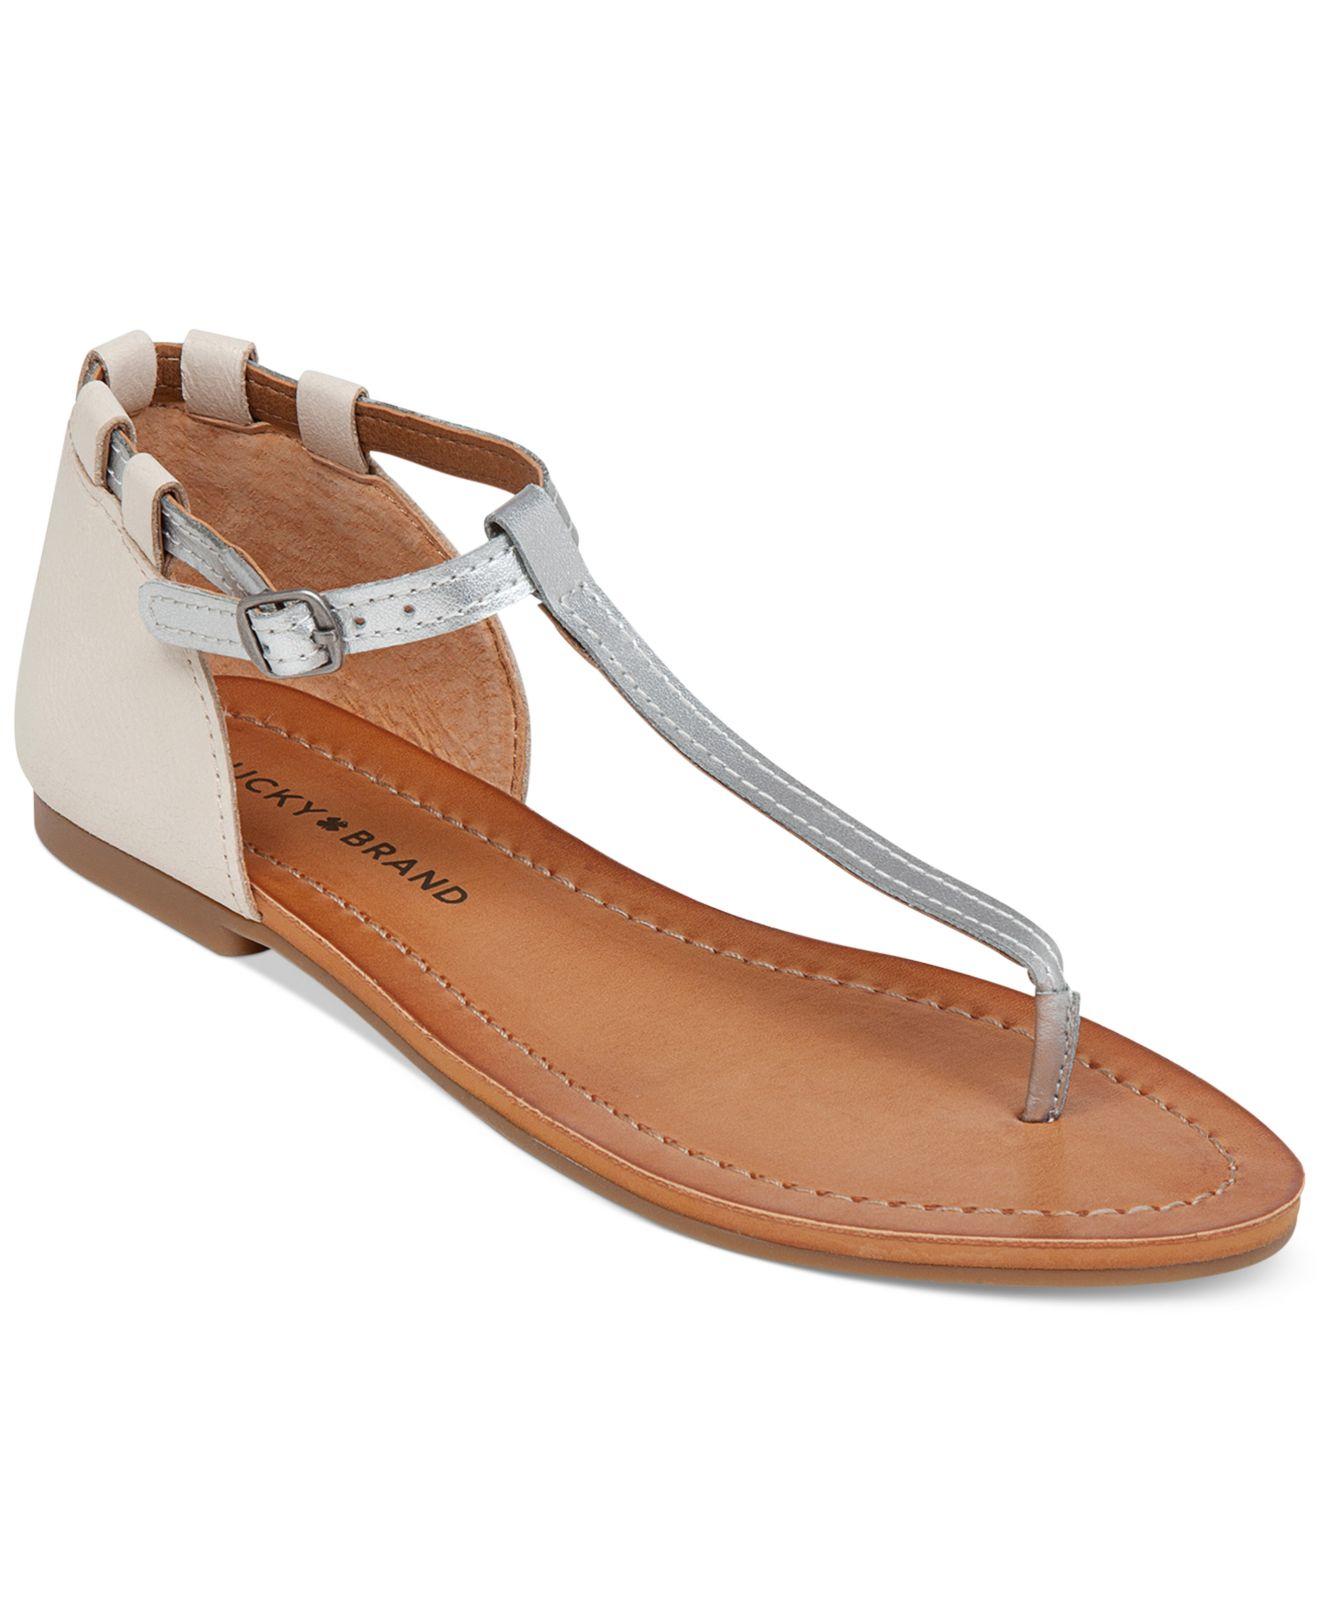 Flat sandals with metallic straps